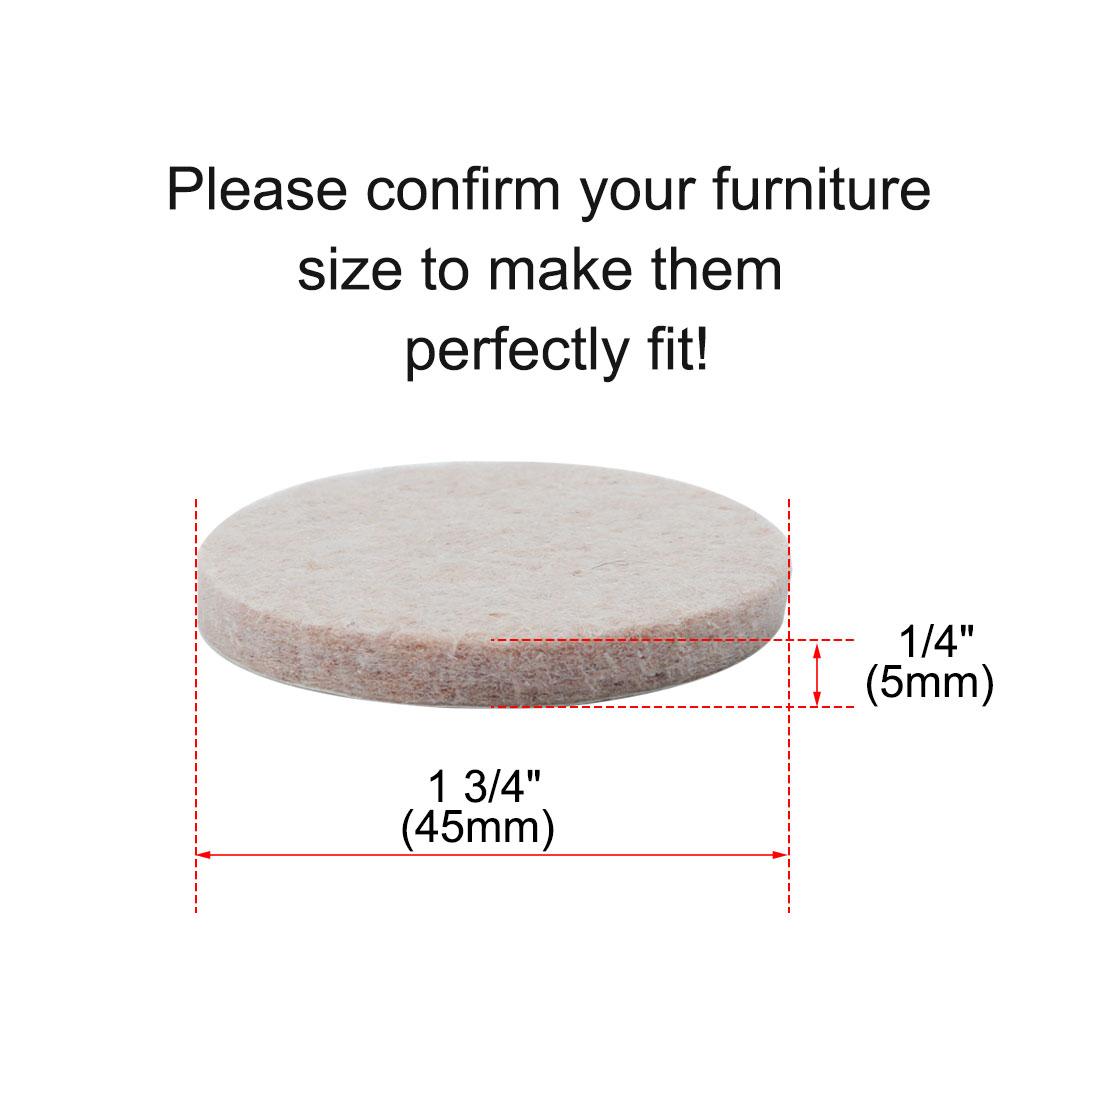 "Felt Furniture Pad Round 1 3/4"" Self Adhesive Anti-scratch Chair Protector 30pcs - image 2 de 7"